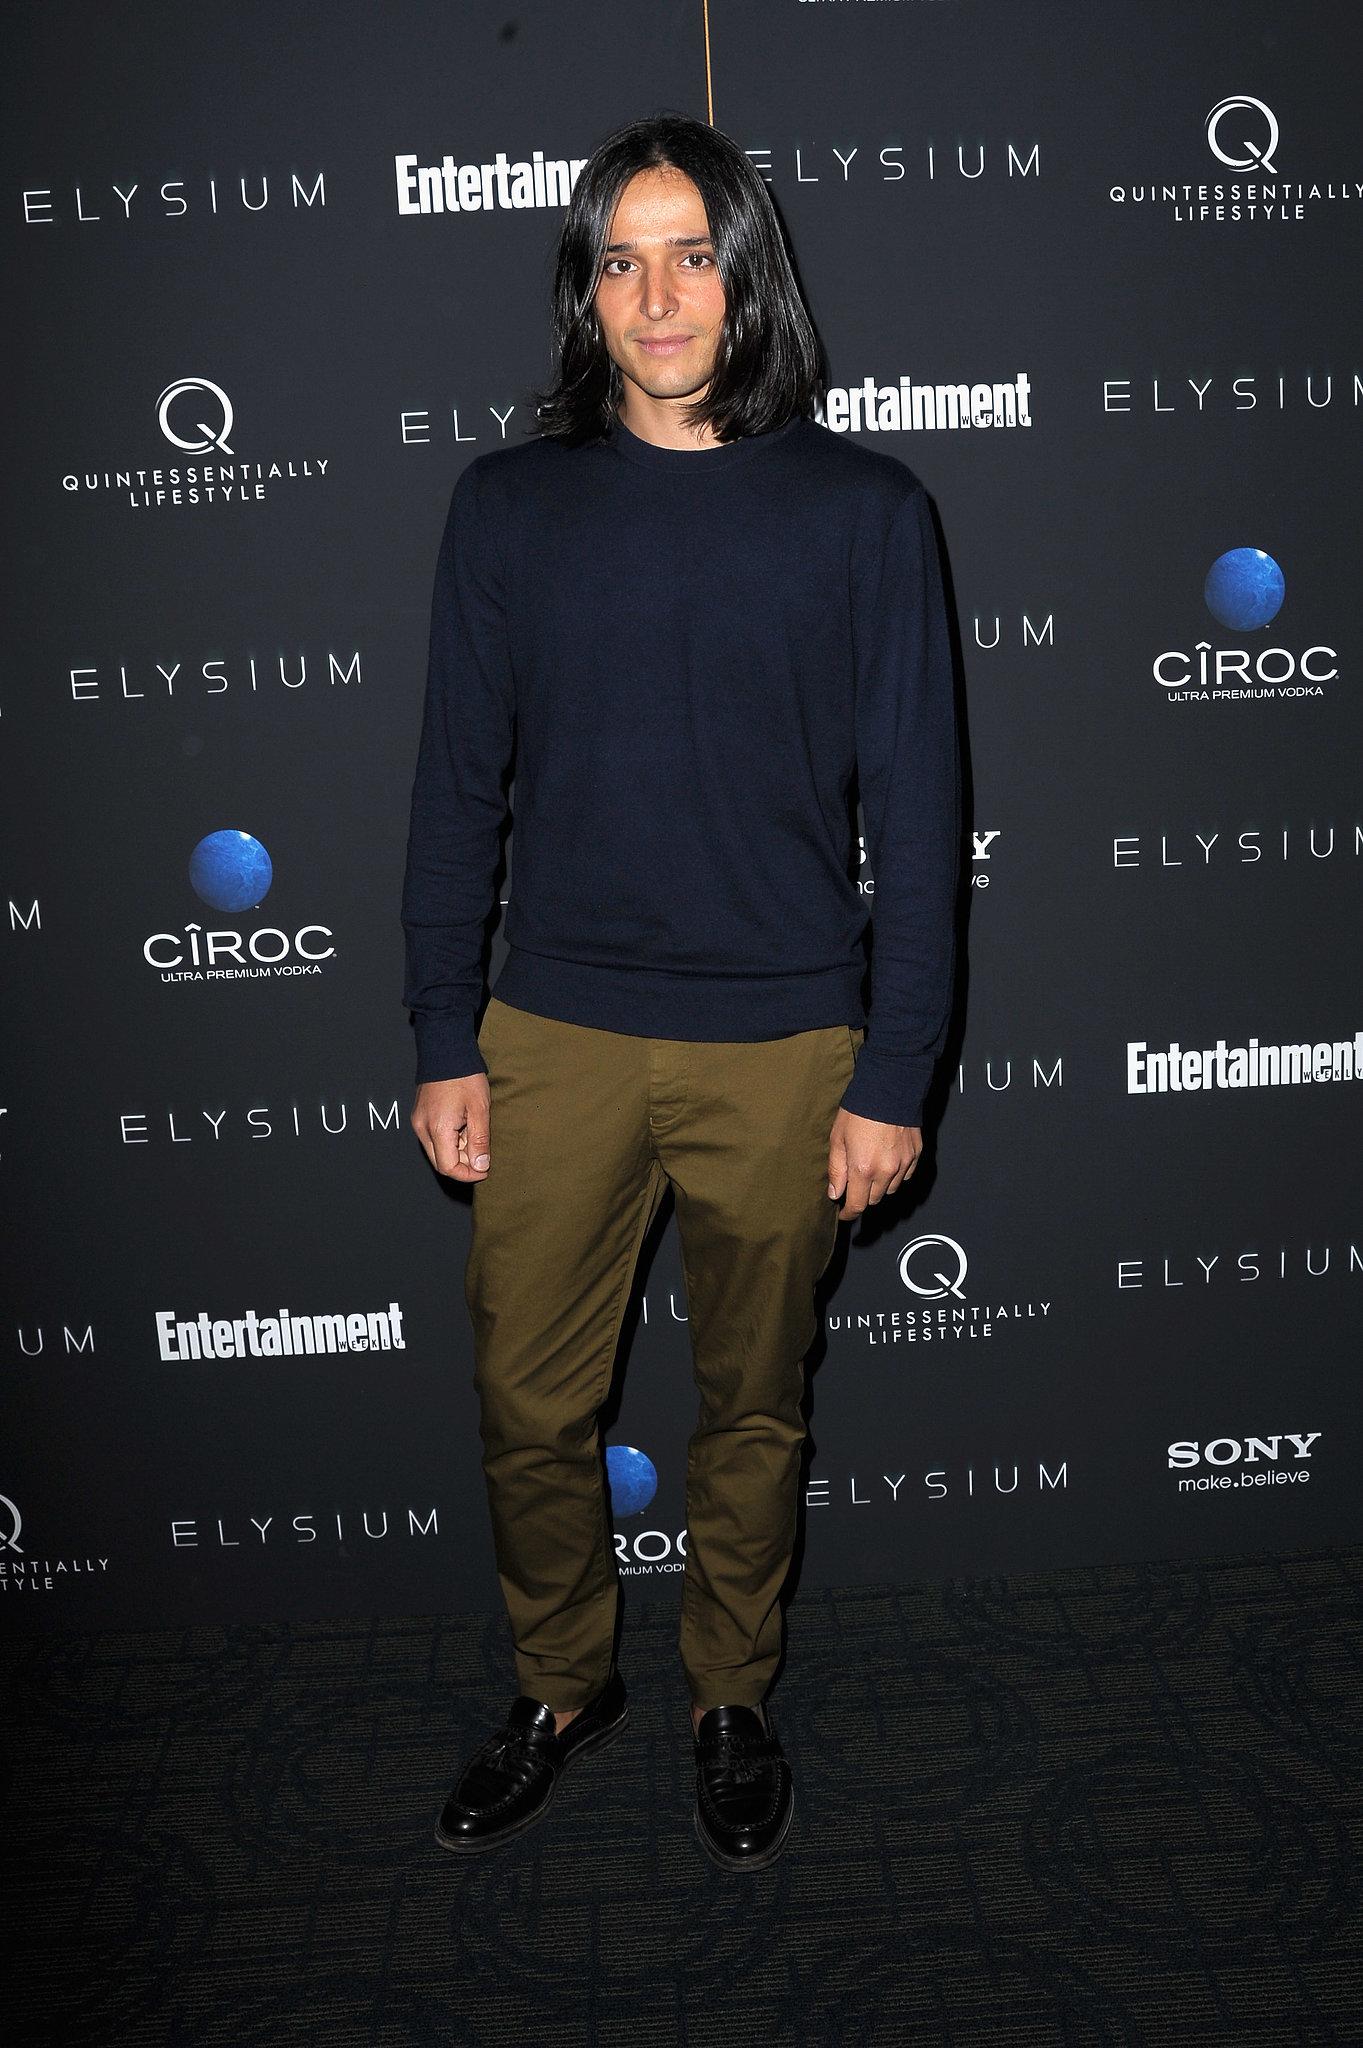 At the New York screening of Elysium, Olivier Theyskens mixed dark, autumnal hues.